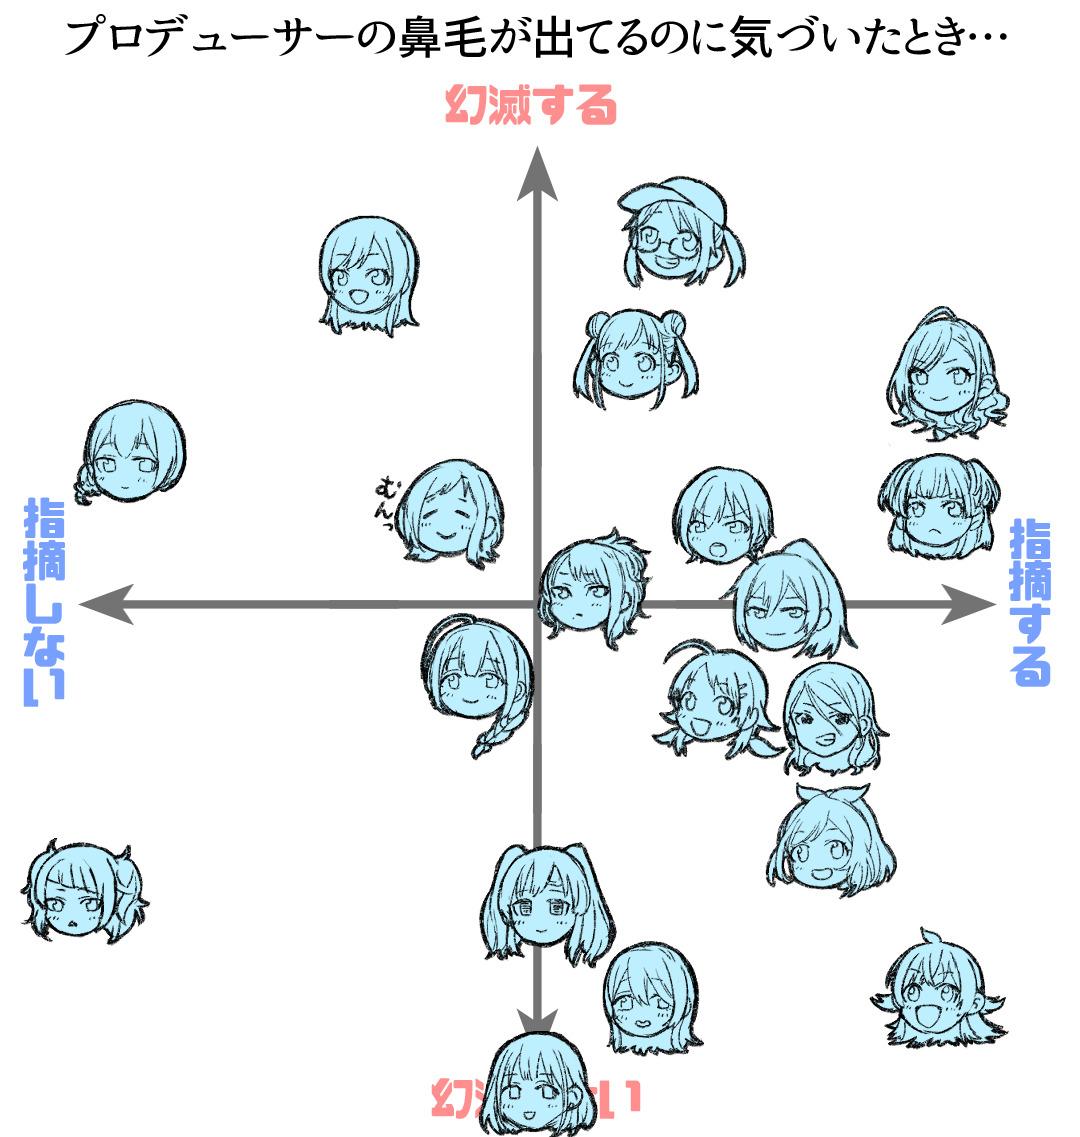 f:id:hoshi_sano:20200414110713j:image:w400